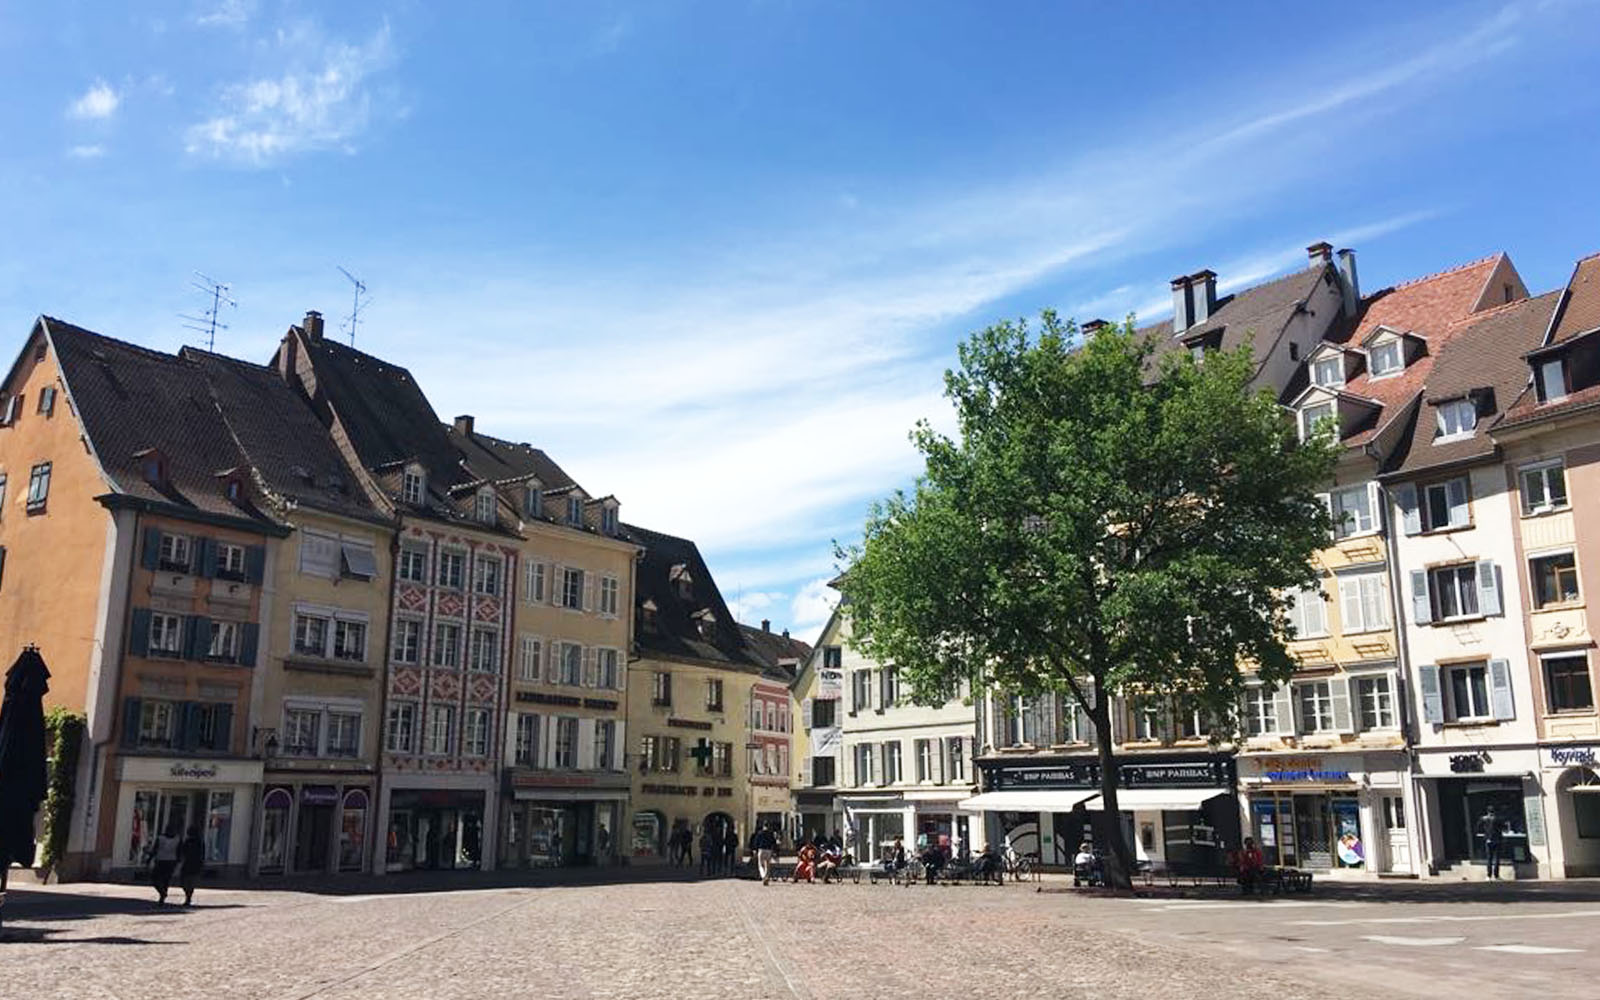 Uno scorcio di Place de la Réunion, a Mulhouse.